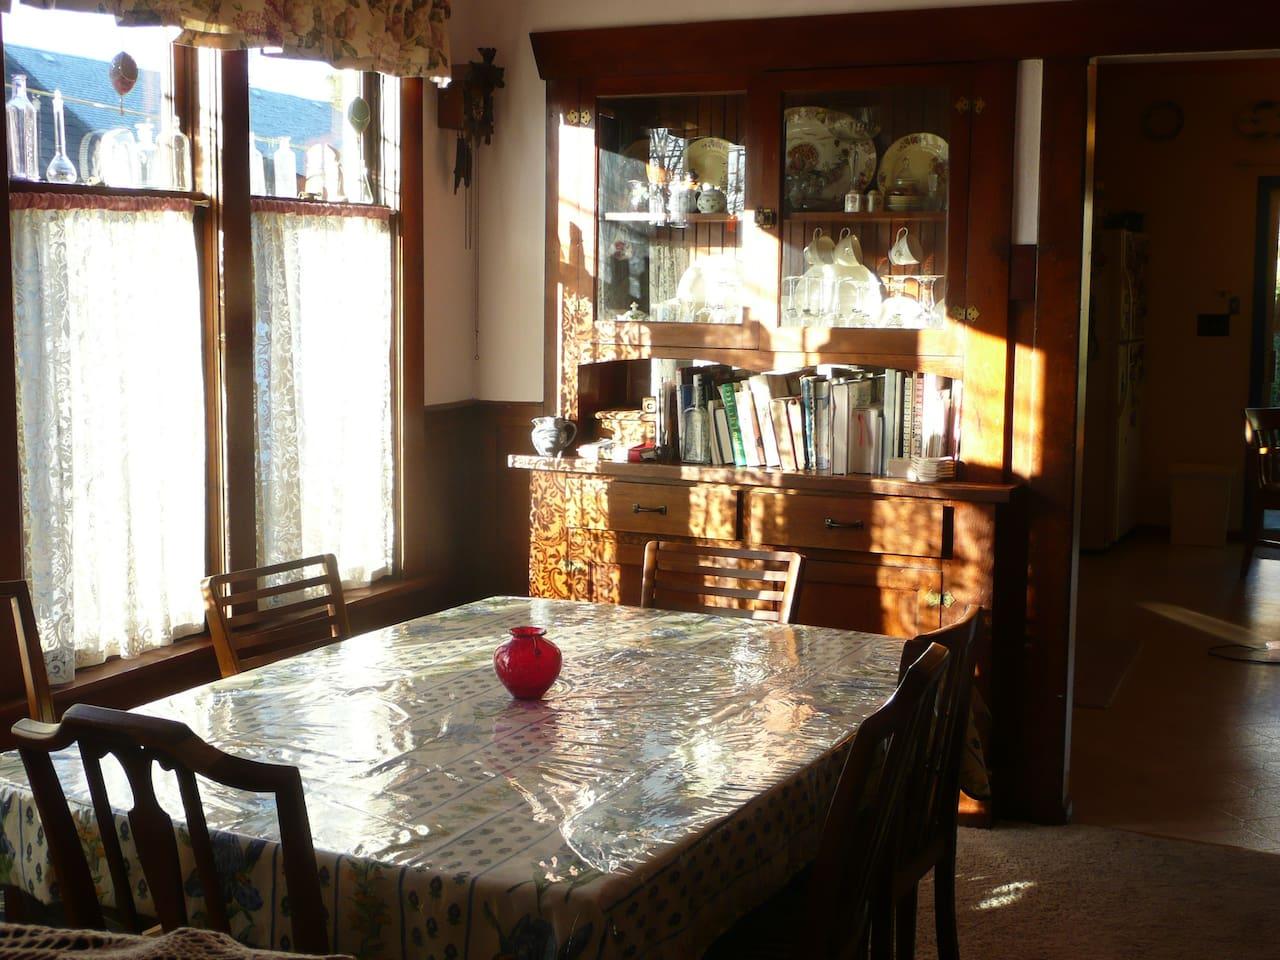 Dining room on main floor